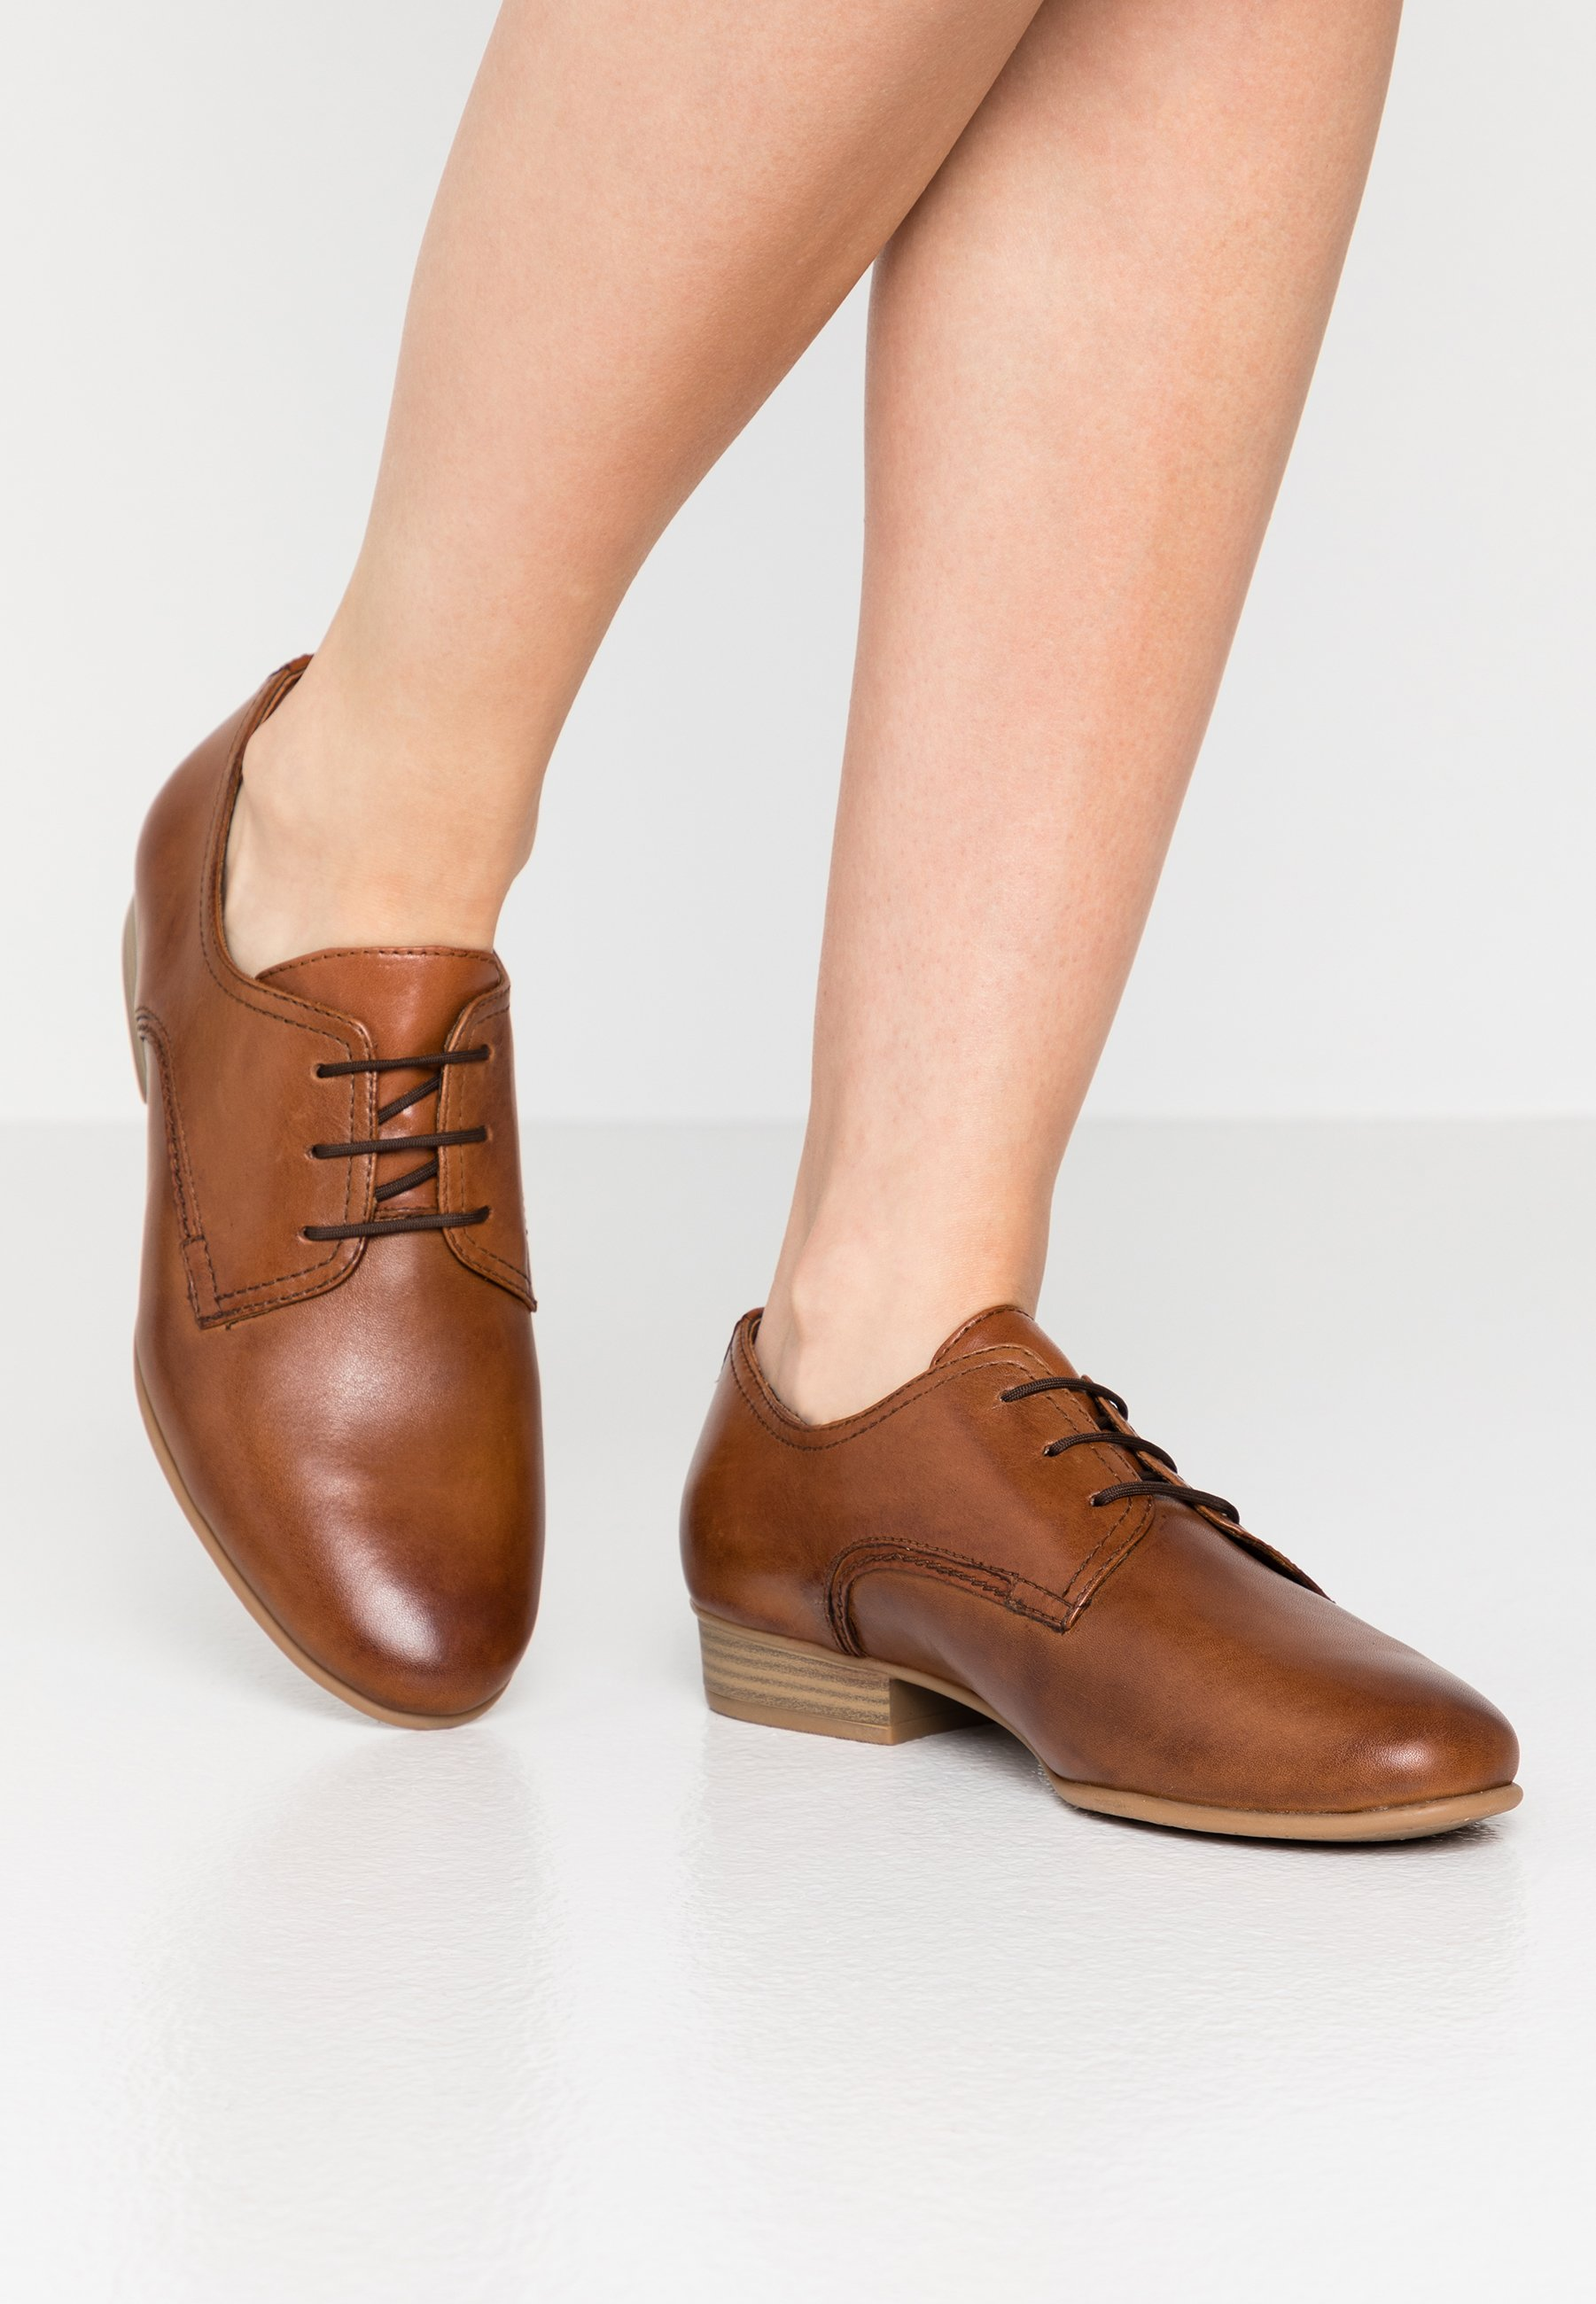 Best Price New Fashion Style Of Women's Shoes Tamaris Lace-ups cognac aVYJMN0Ys yRoe0jGni